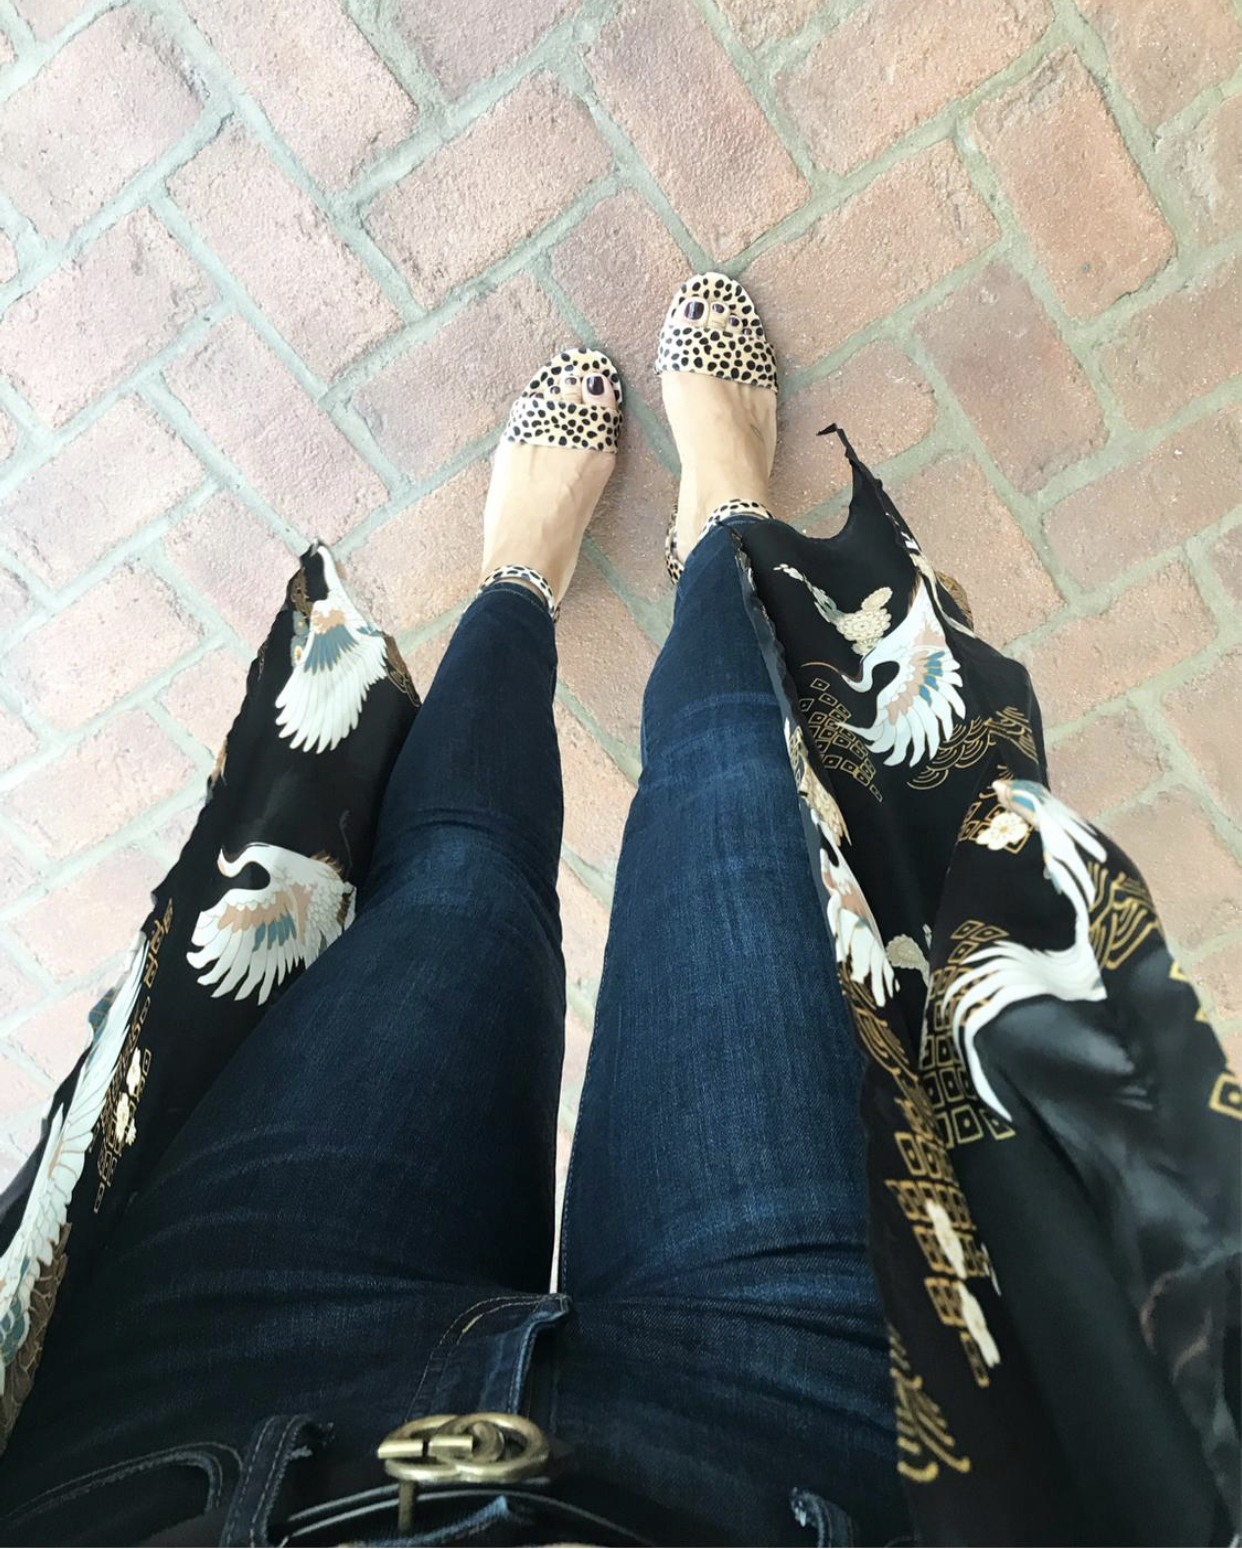 Leopard, Leopard Block Heels, Kimono, Gucci Dupe Belt, How to Style Kimono, Dark Denim, Skinny Jeans, https://rstyle.me/n/dd8hgcccvt7